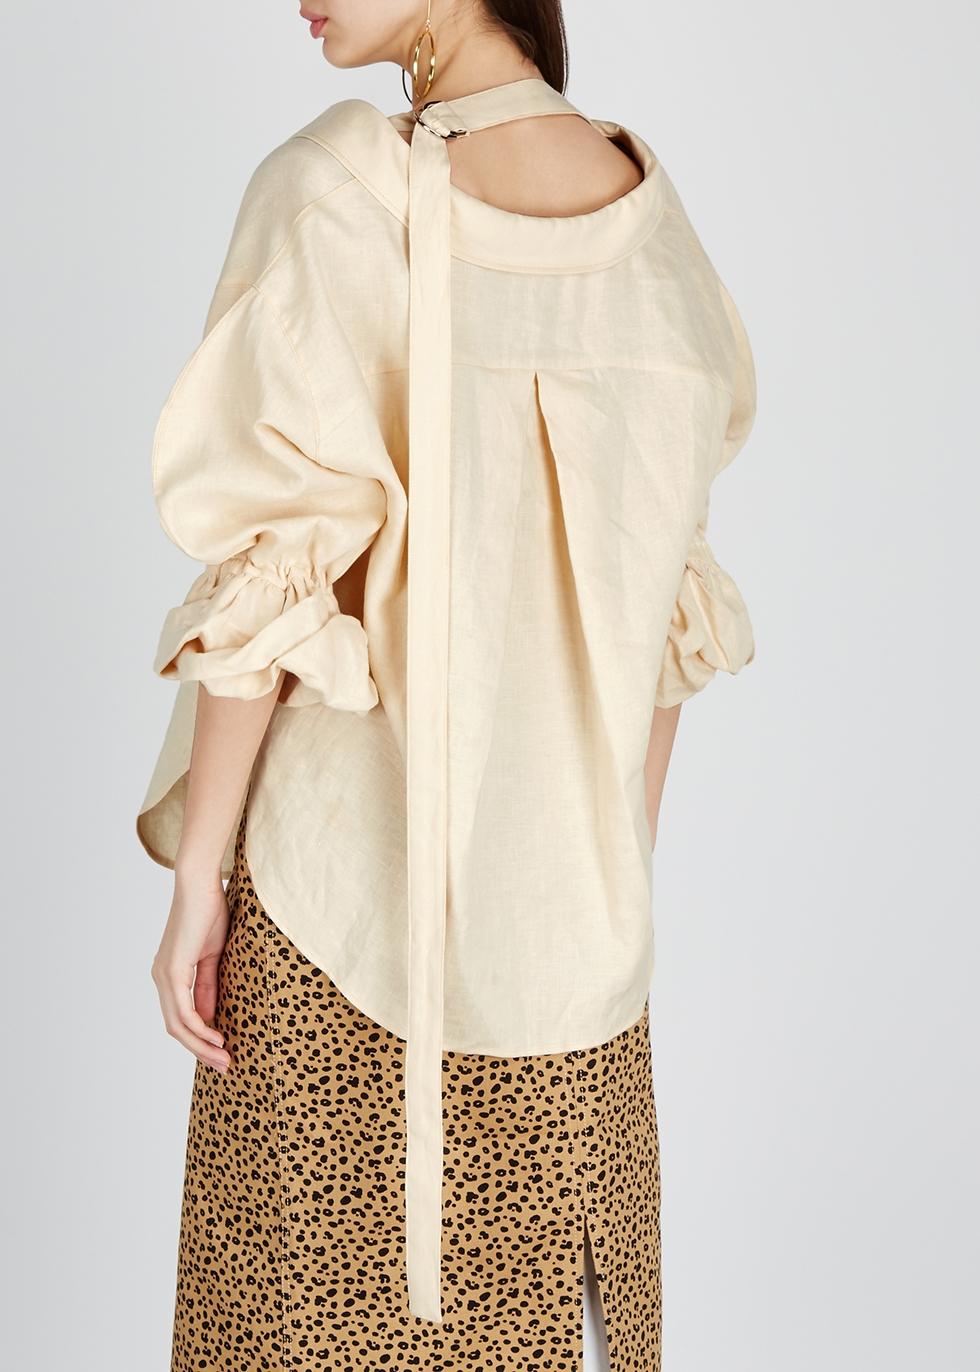 Amber cream linen shirt - Rejina Pyo